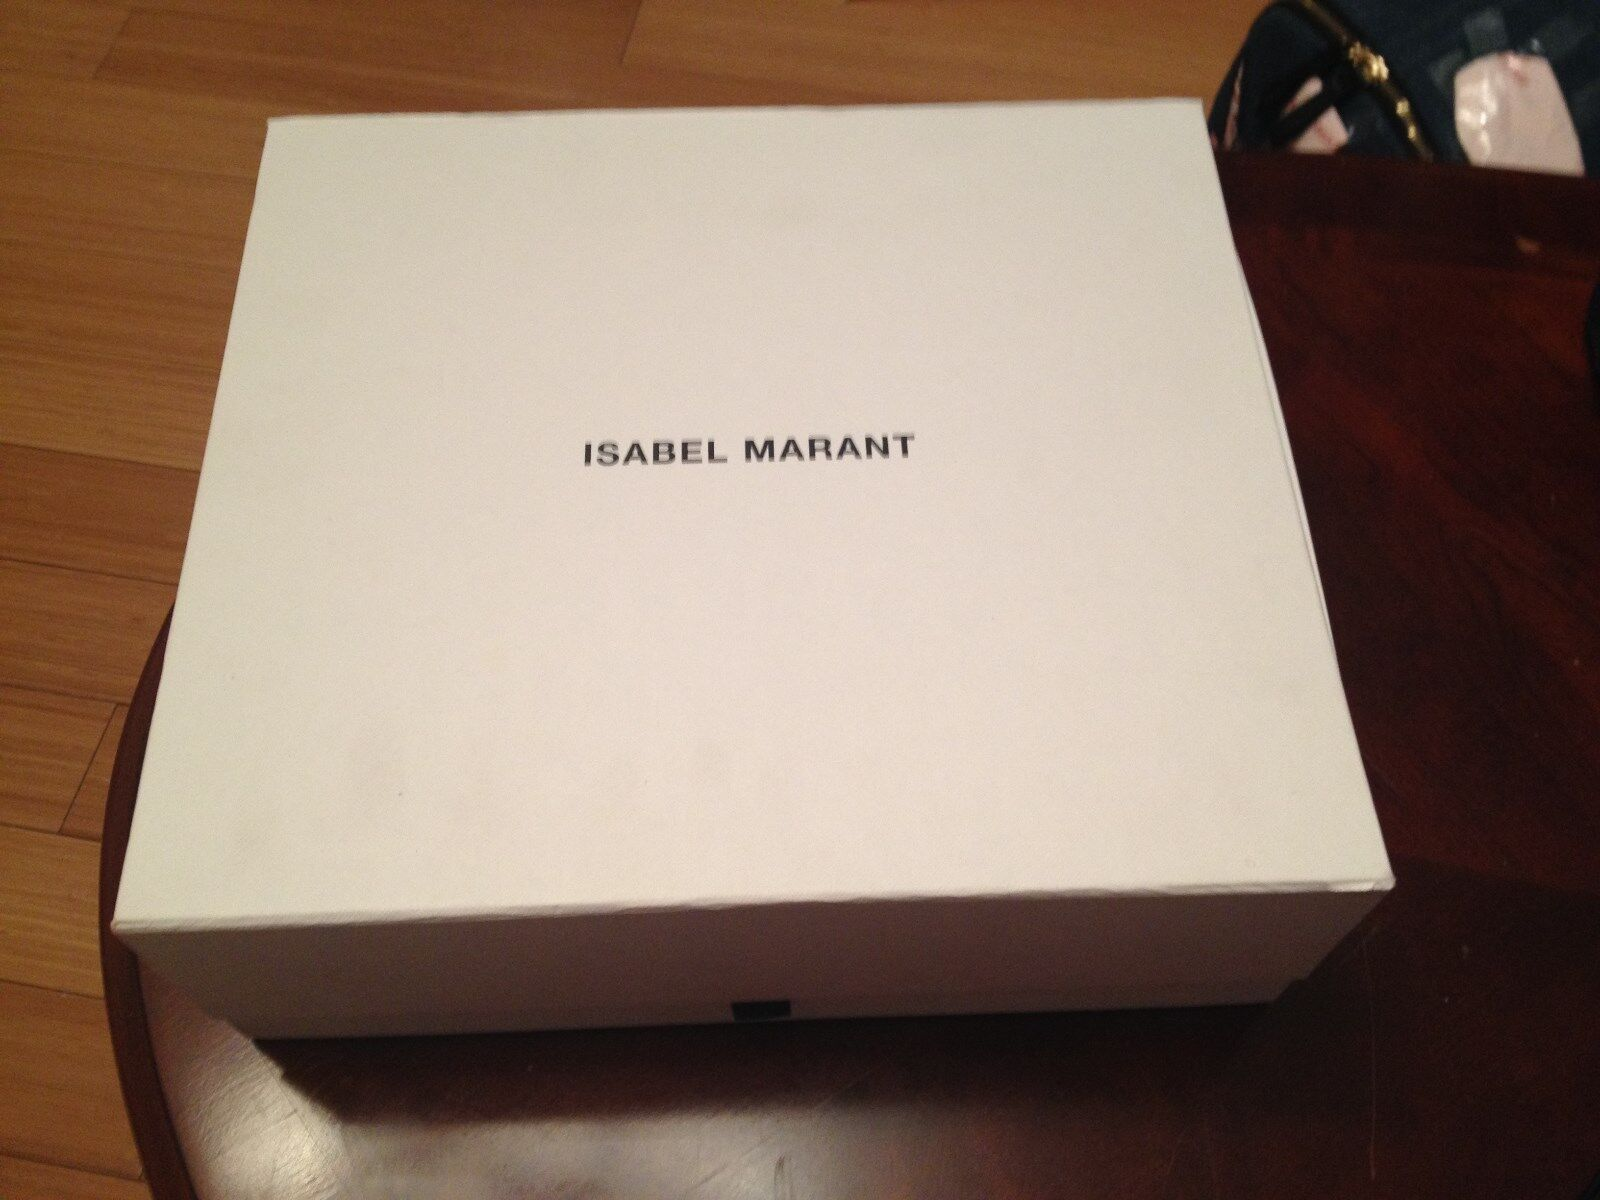 ISABEL MARANT Top Sneaker Blau Beige Beige Beige Damen Schuhe Beckett Schuhes Gr.39 NEU 83245a